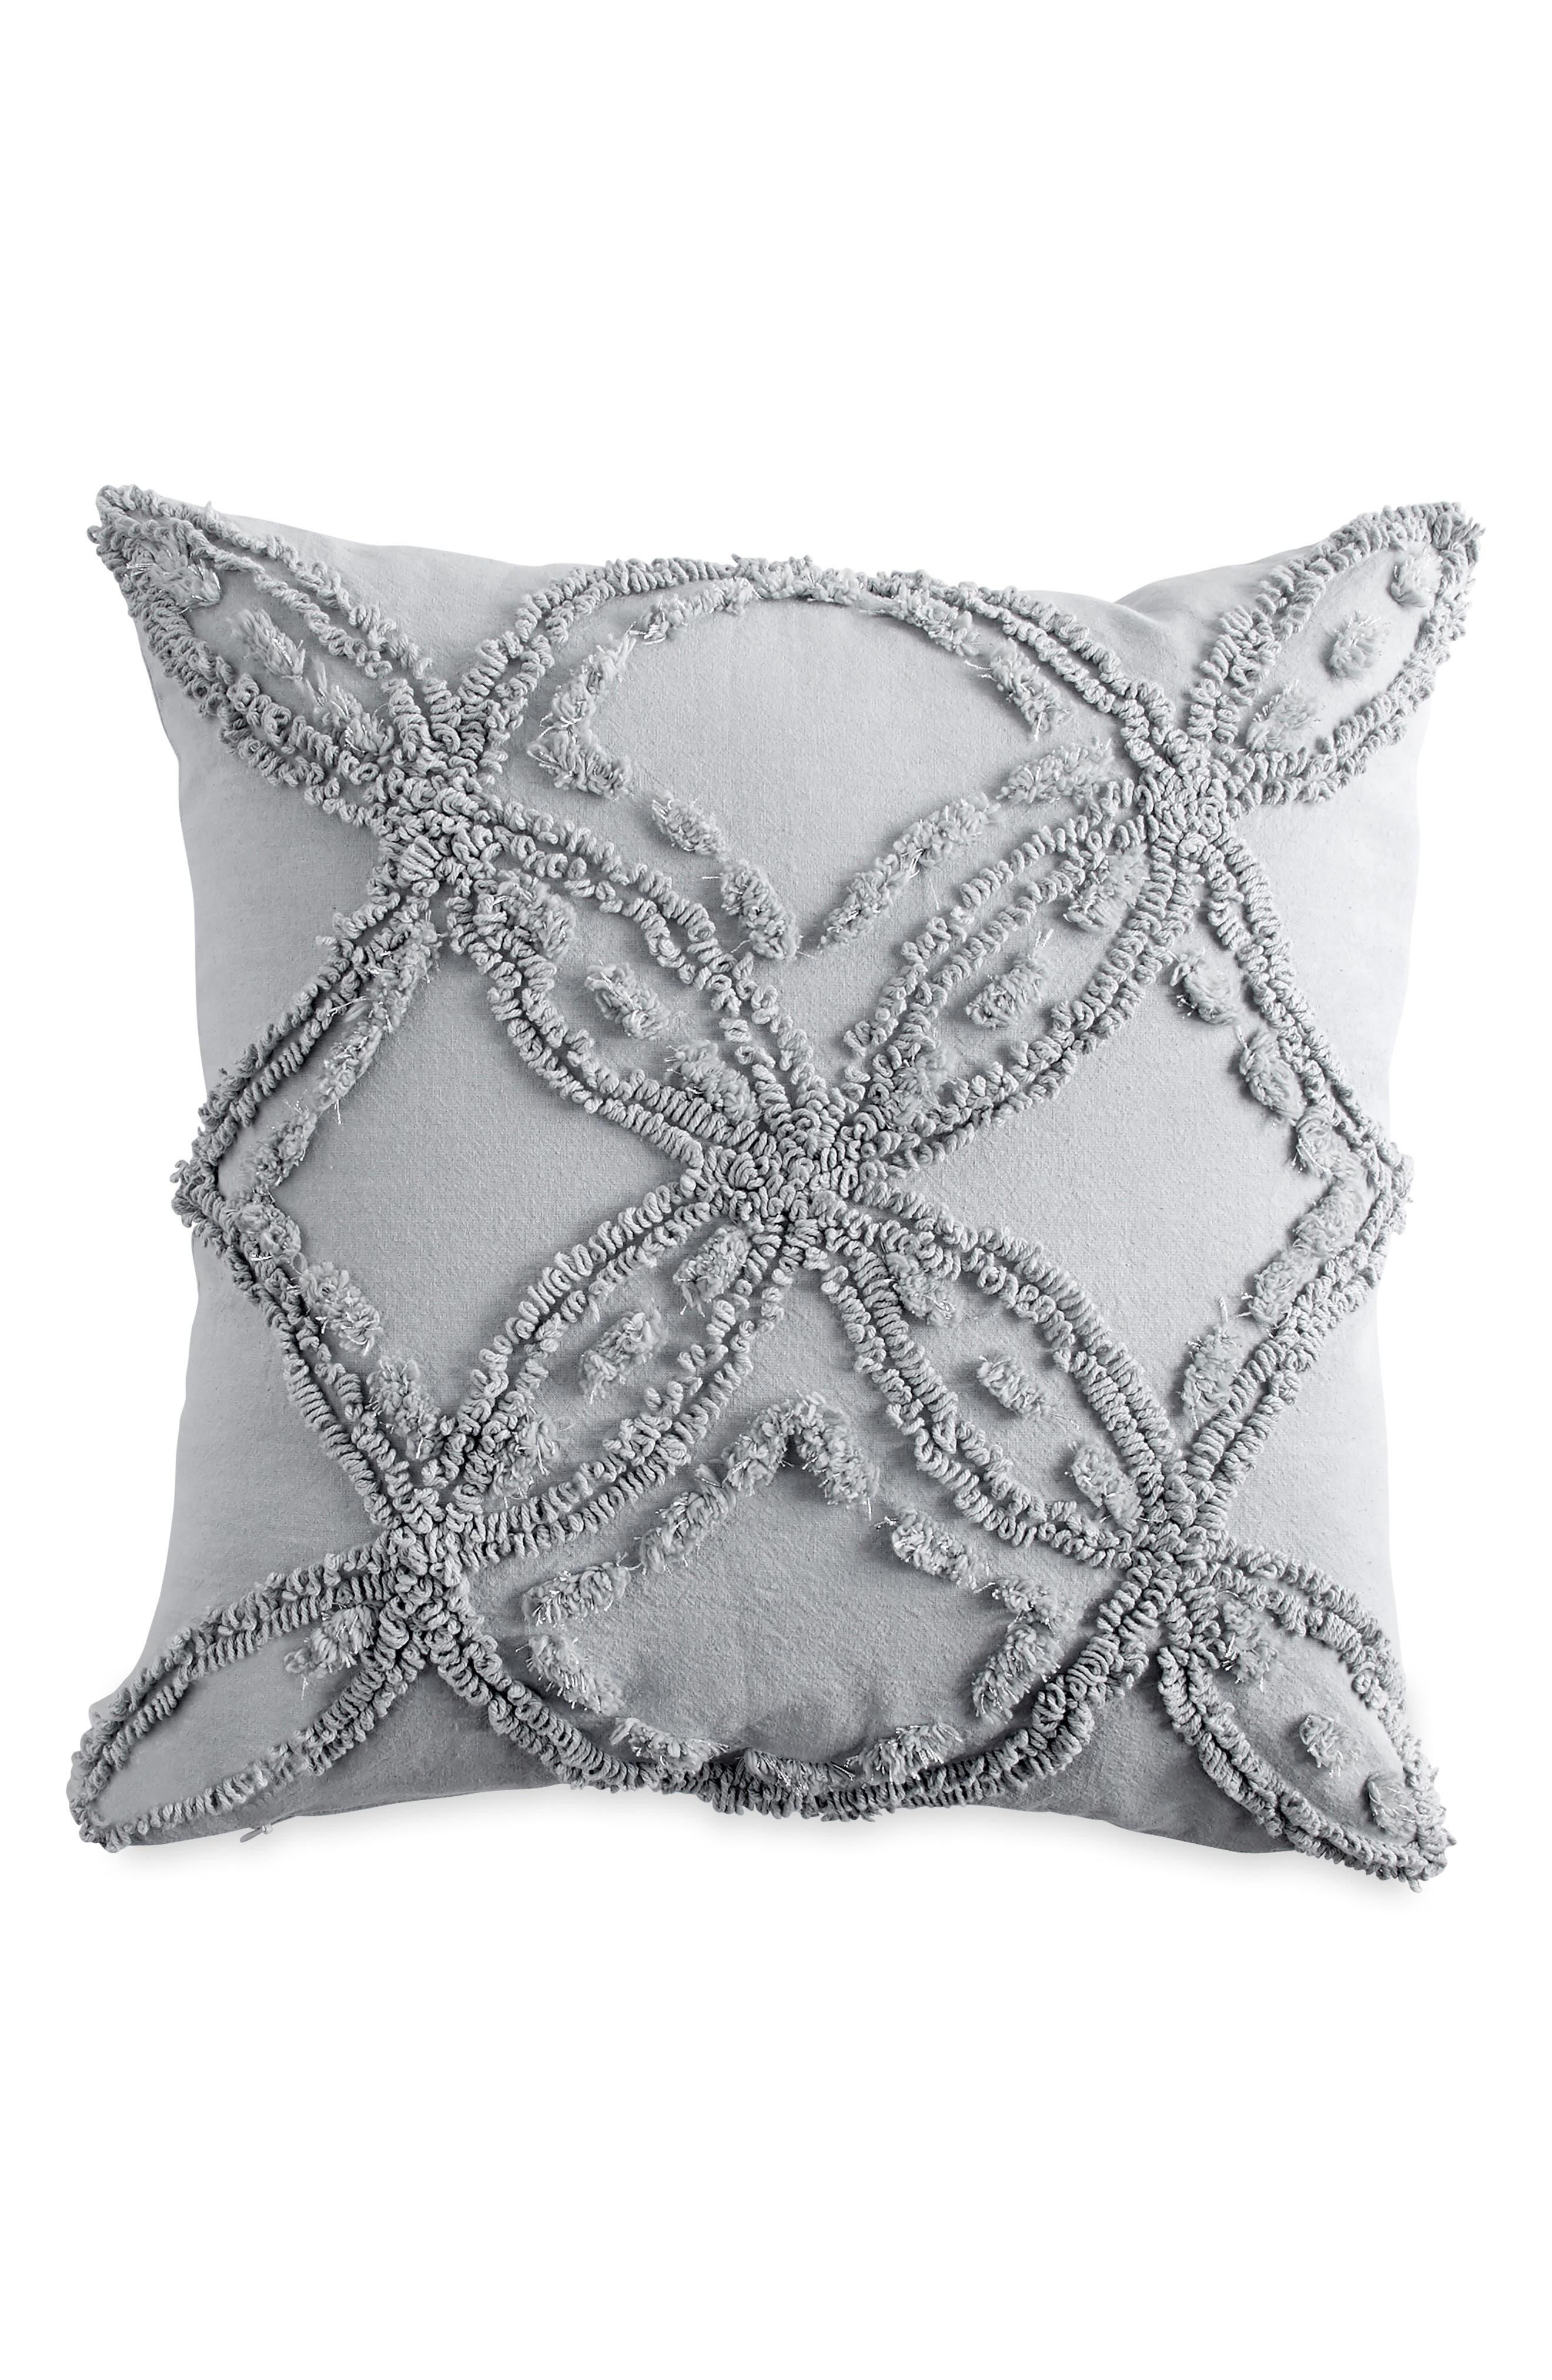 PERI HOME, Chenille Pillow, Main thumbnail 1, color, GREY